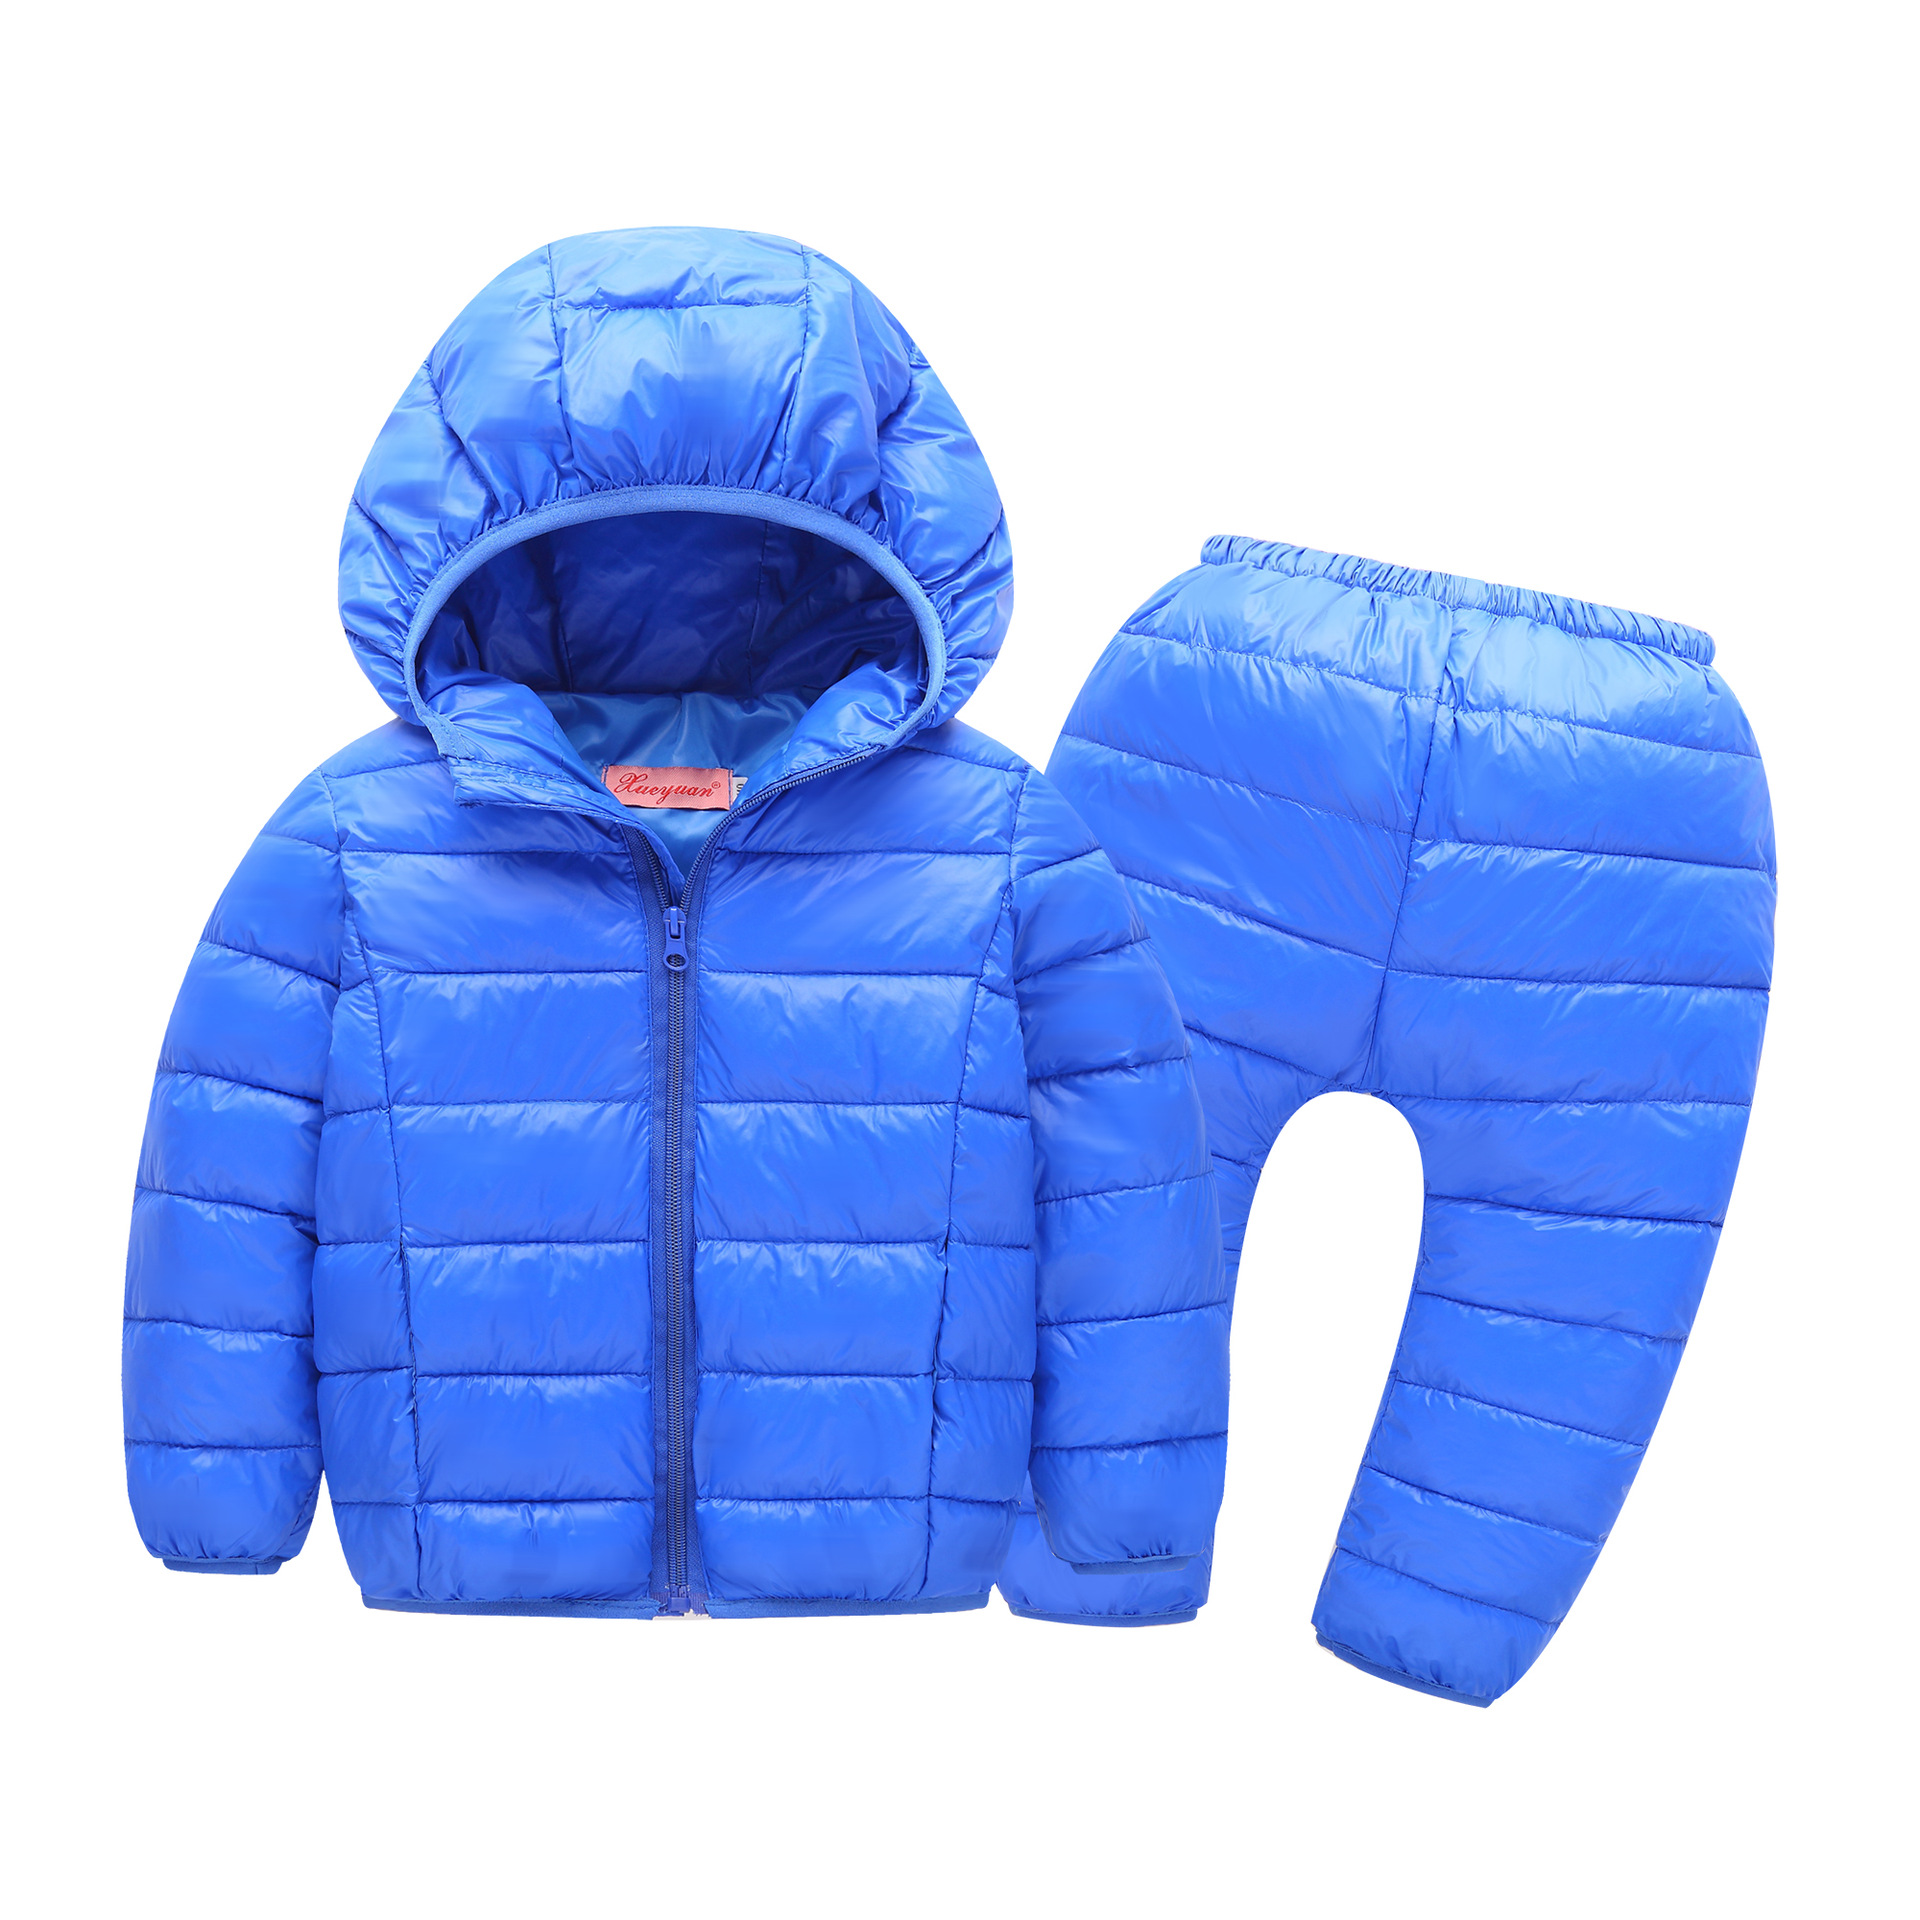 New Girls Cotton-Padded Coat Suit Children Warm Winter Set Sport Baby Girl Jackets/coat+trousers 2pcs Set for Winter Infant Coat girl jackets coat for winter baby girl down